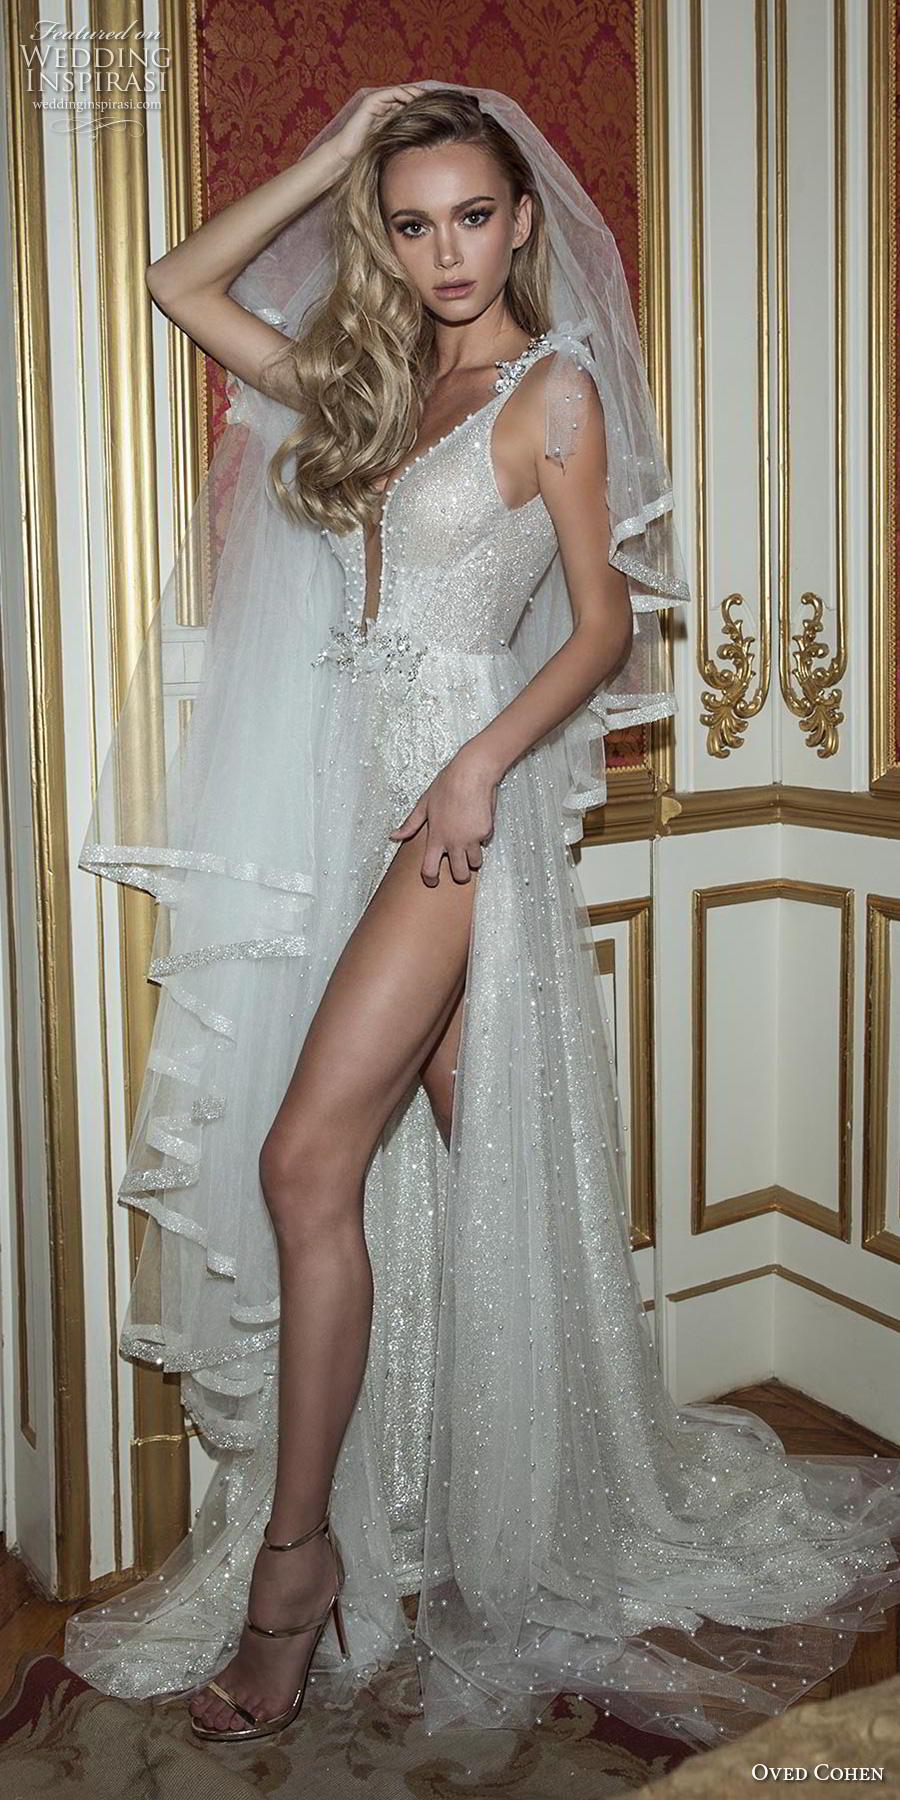 oved cohen 2018 bridal sleeveless thin strap deep plunging sweetheart neckline full embellishment slit skirt glitzy glamorous sexy medium train (7) lv